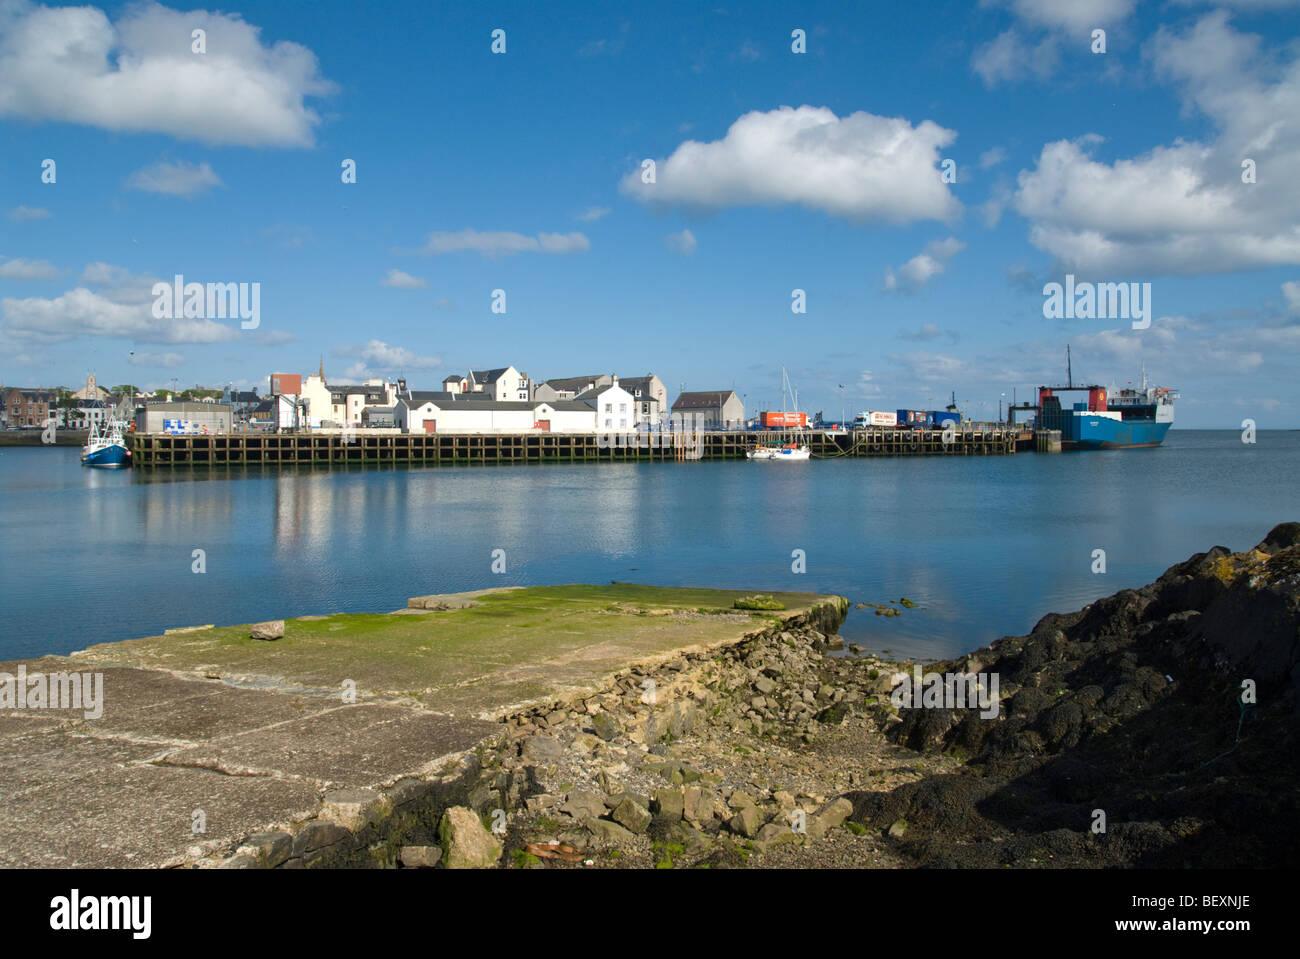 View across Stornoway harbour, Isle of Lewis, Scotland - Stock Image